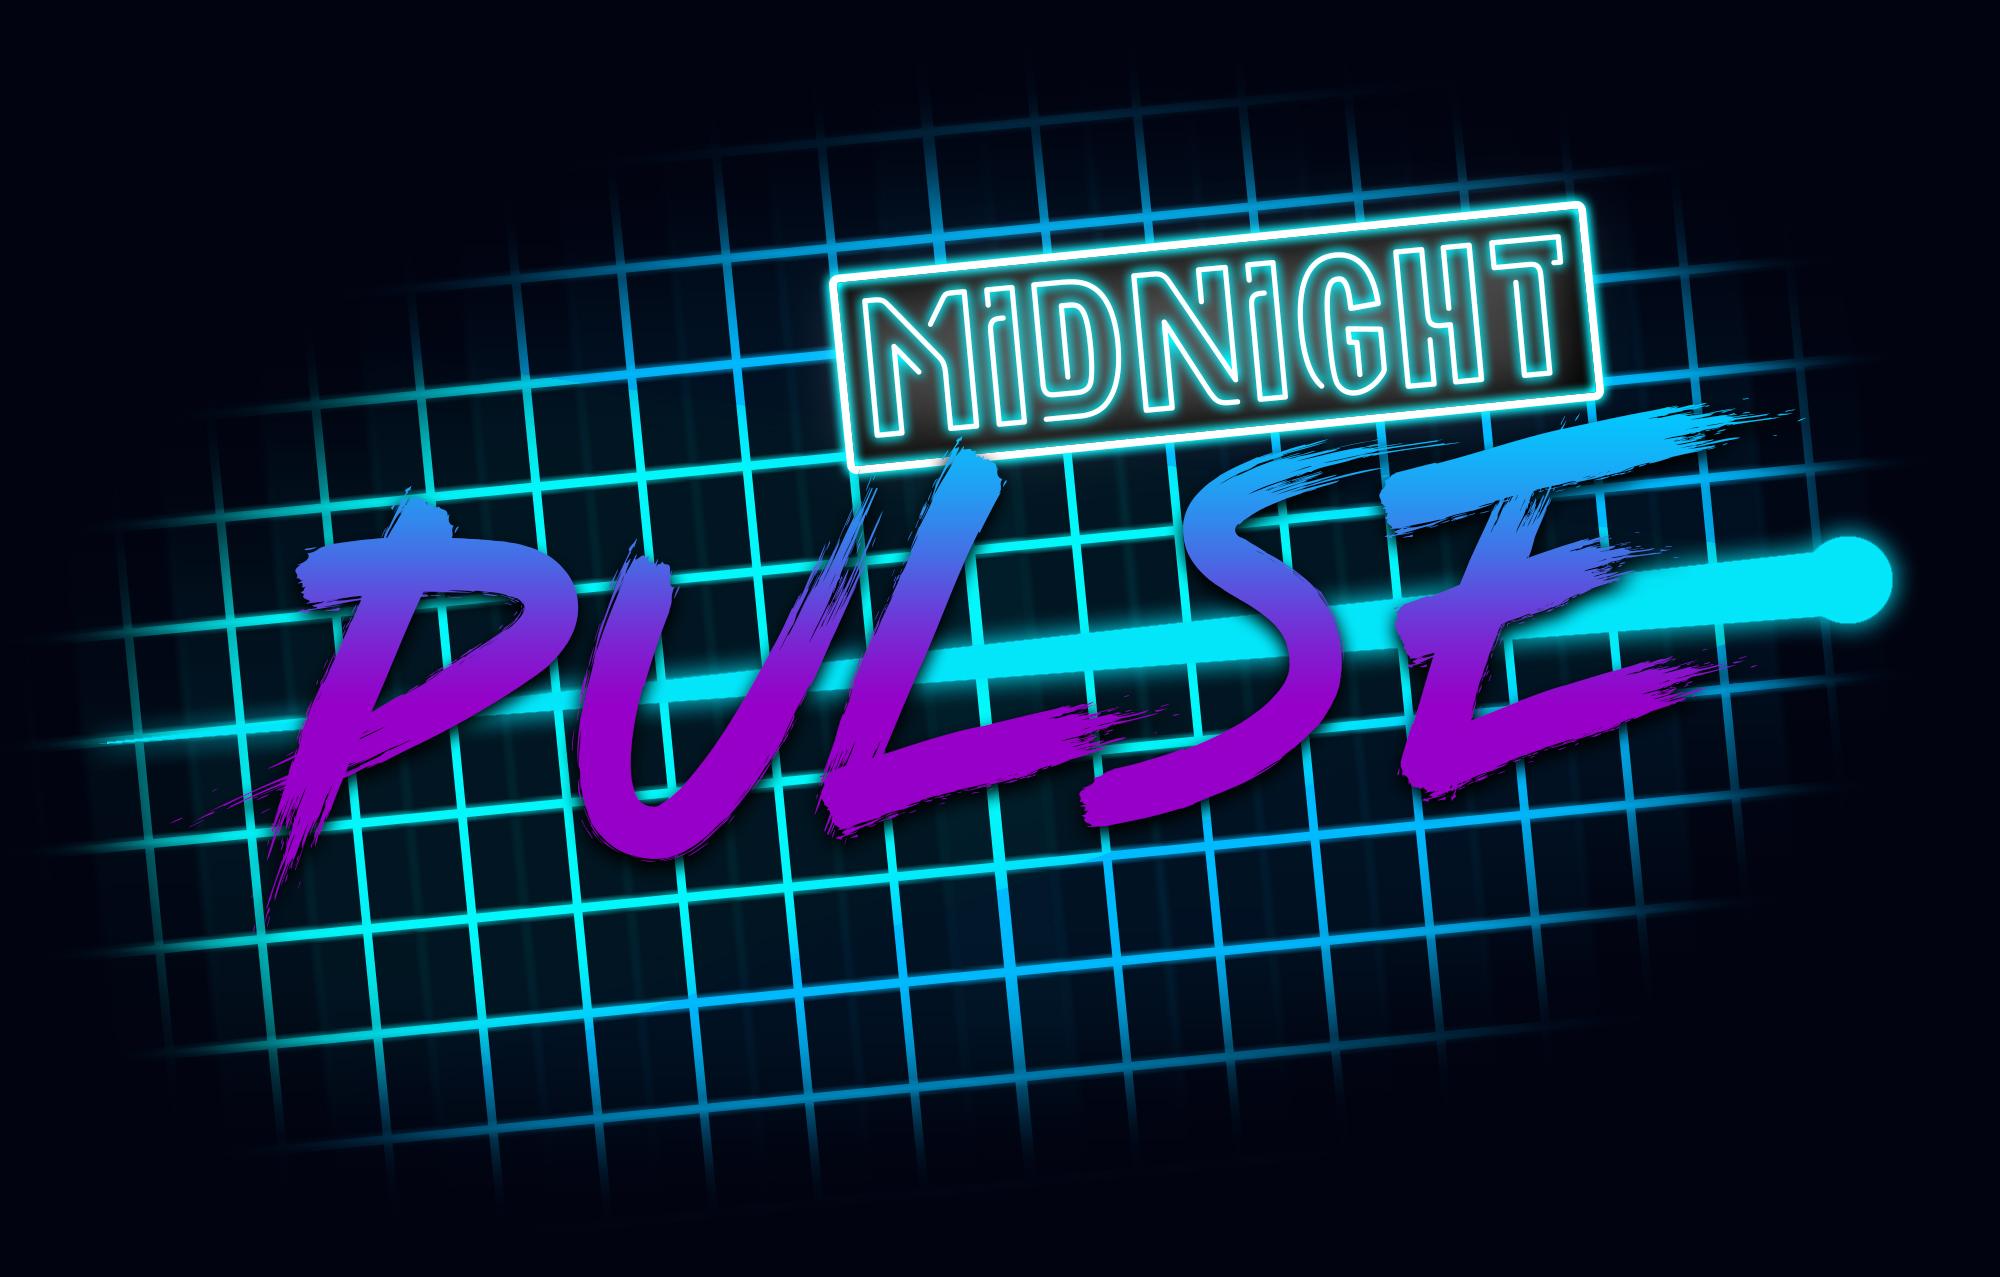 Midnight pulse (Ludum dare version)